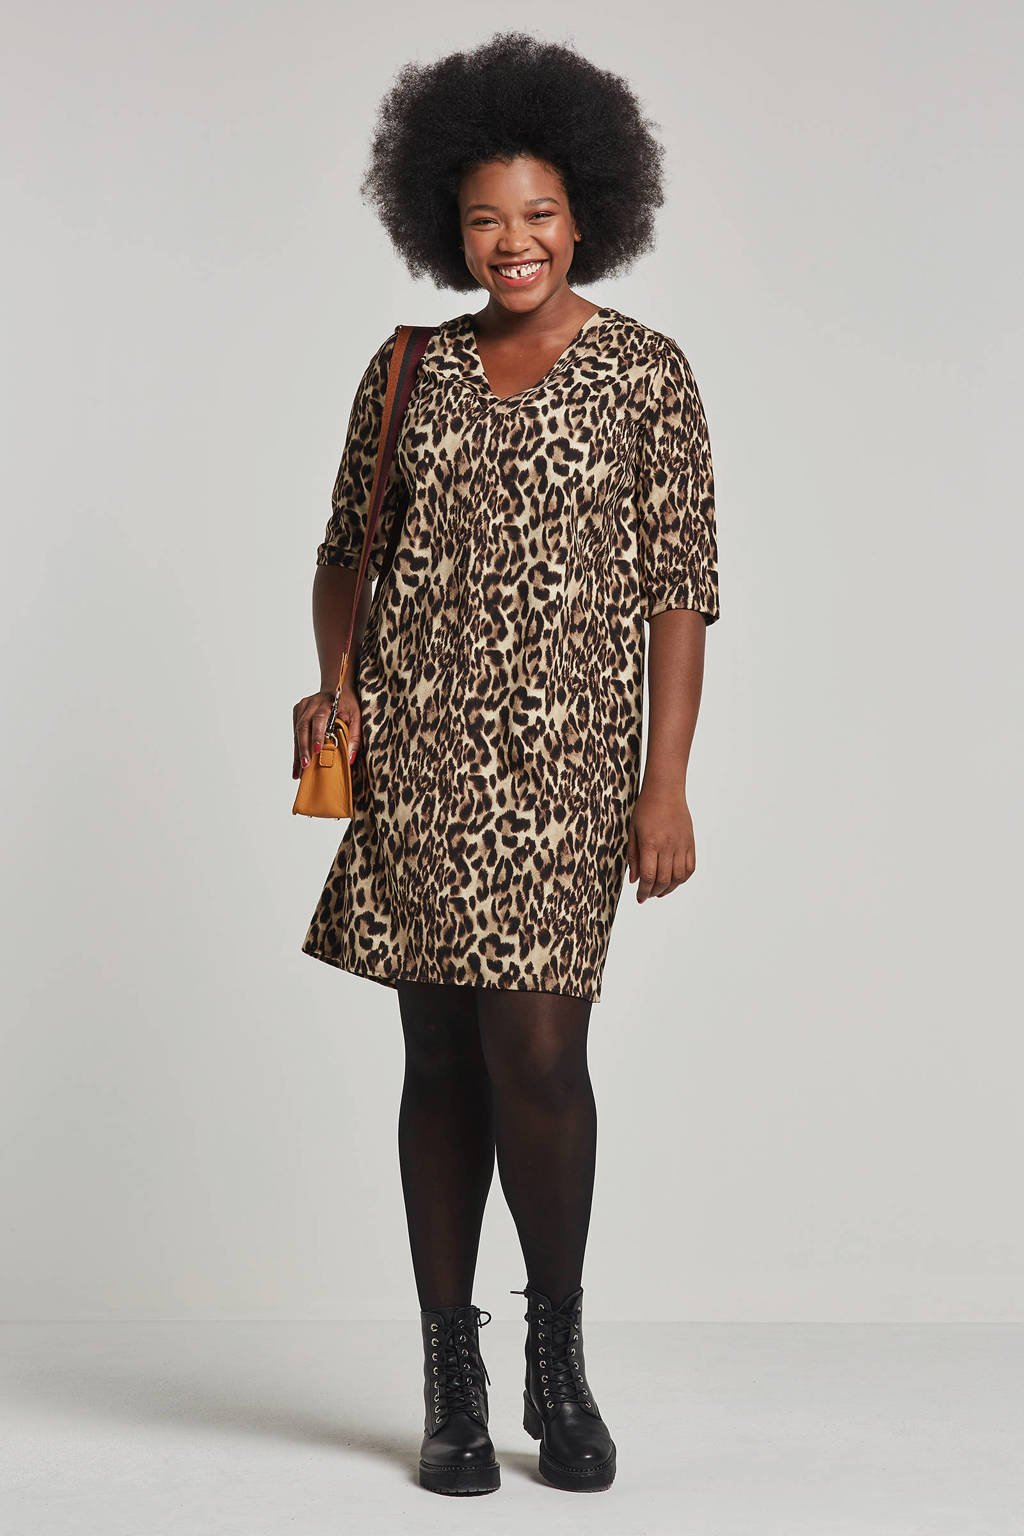 whkmp's great looks jersey jurk met dierenprint camel/bruin/zwart, Camel/bruin/zwart